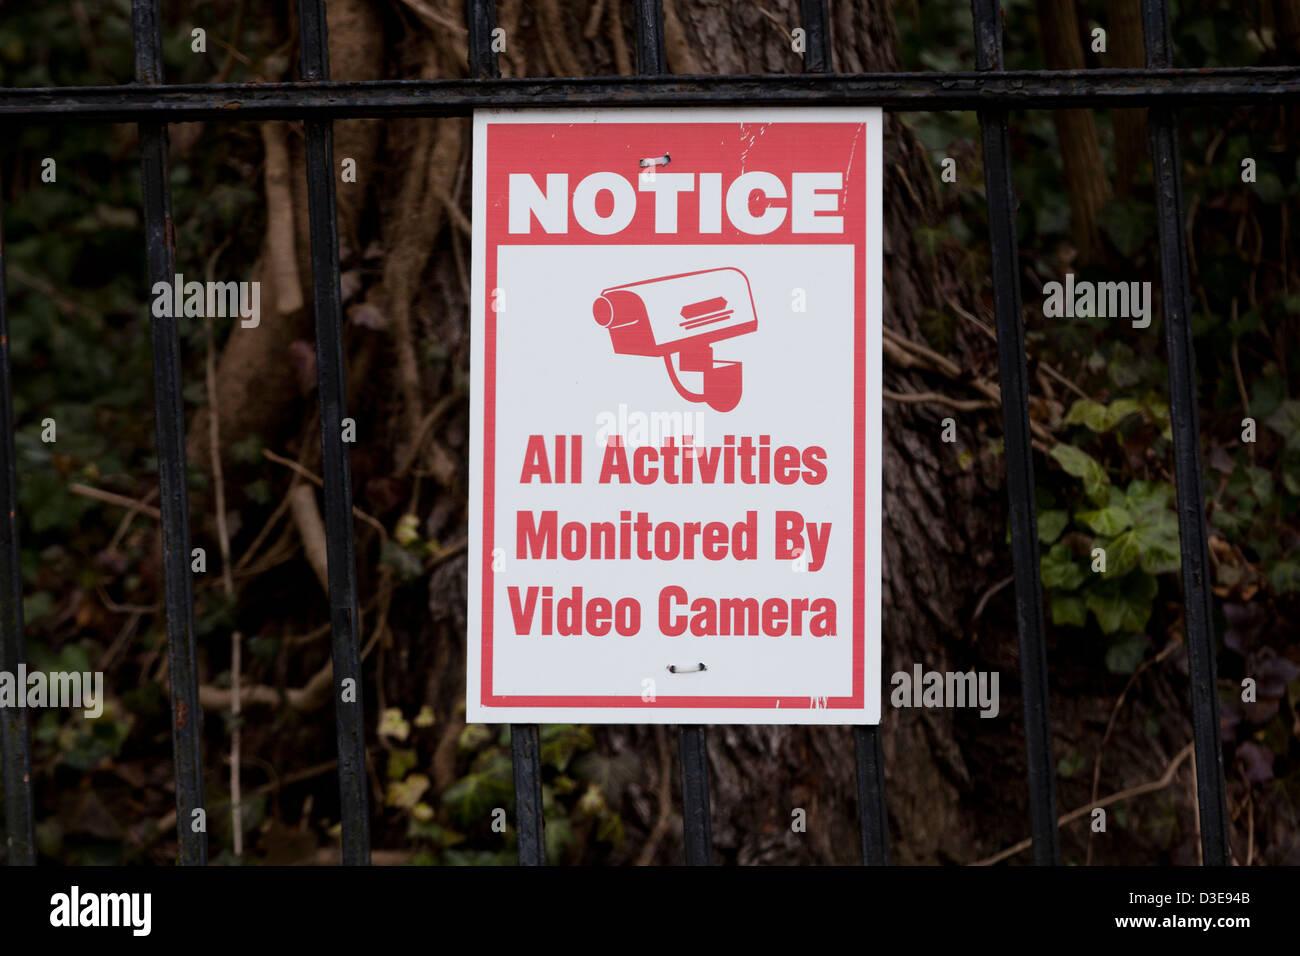 Video surveillance notice - Stock Image